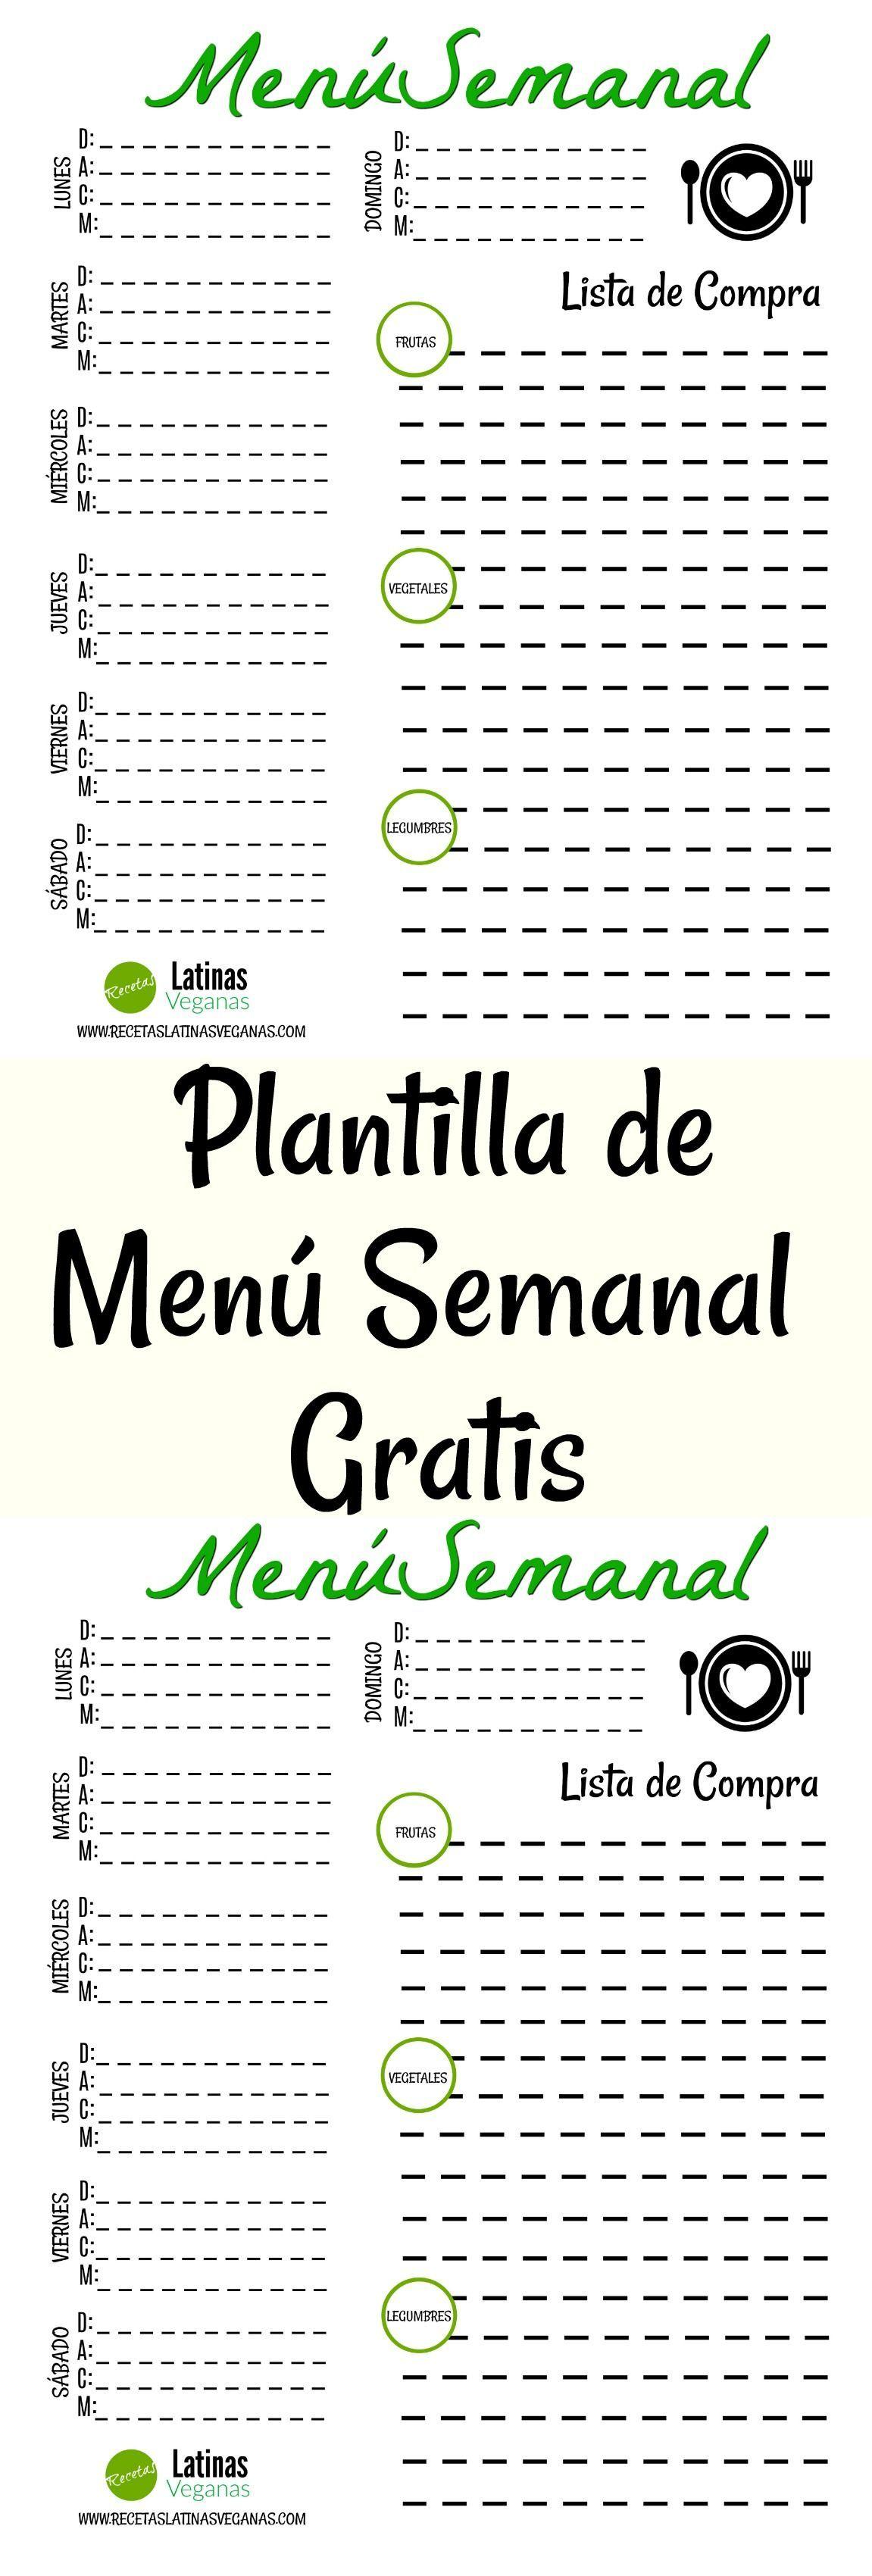 46+ Plantilla menu semanal trends